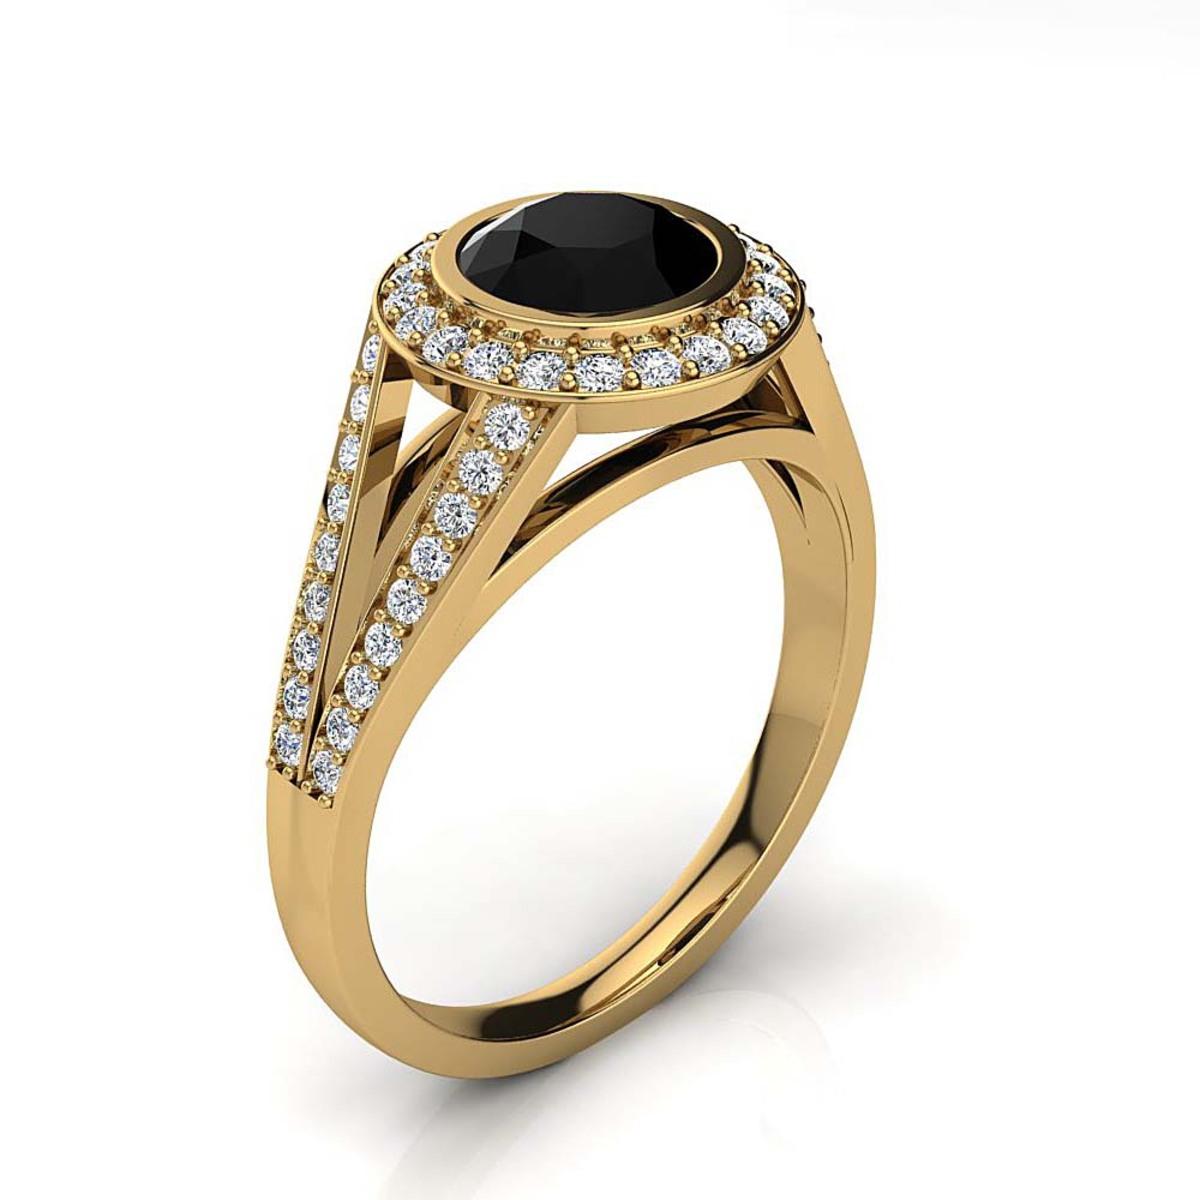 Halo White & Black Diamond Engagement Ring 1.35ct 14K Gold by Luxurman